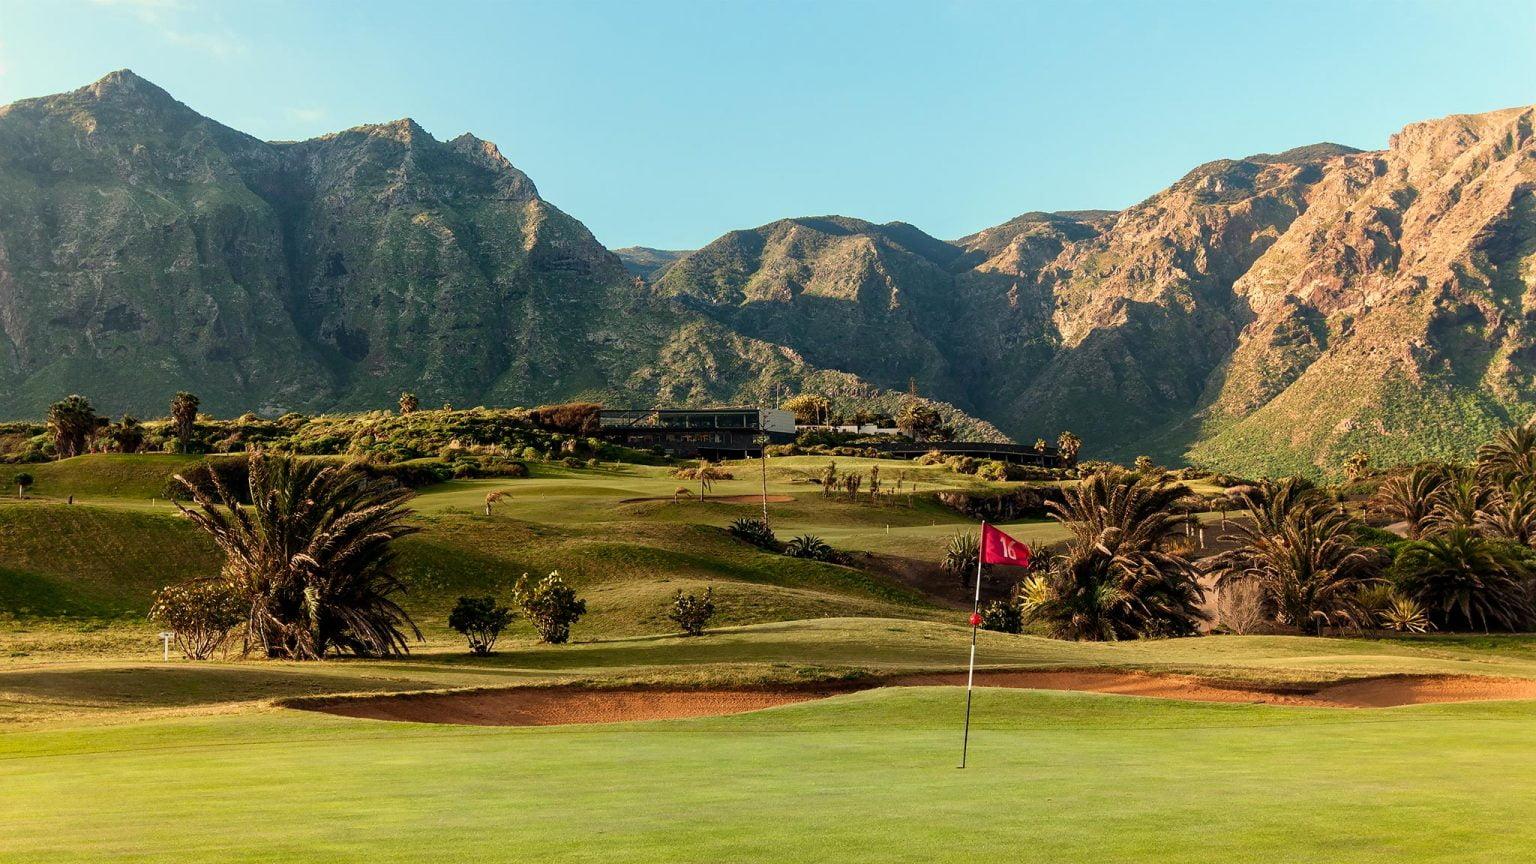 Buena-Vista-Golf, Tenerife, Canary Islands, Spain